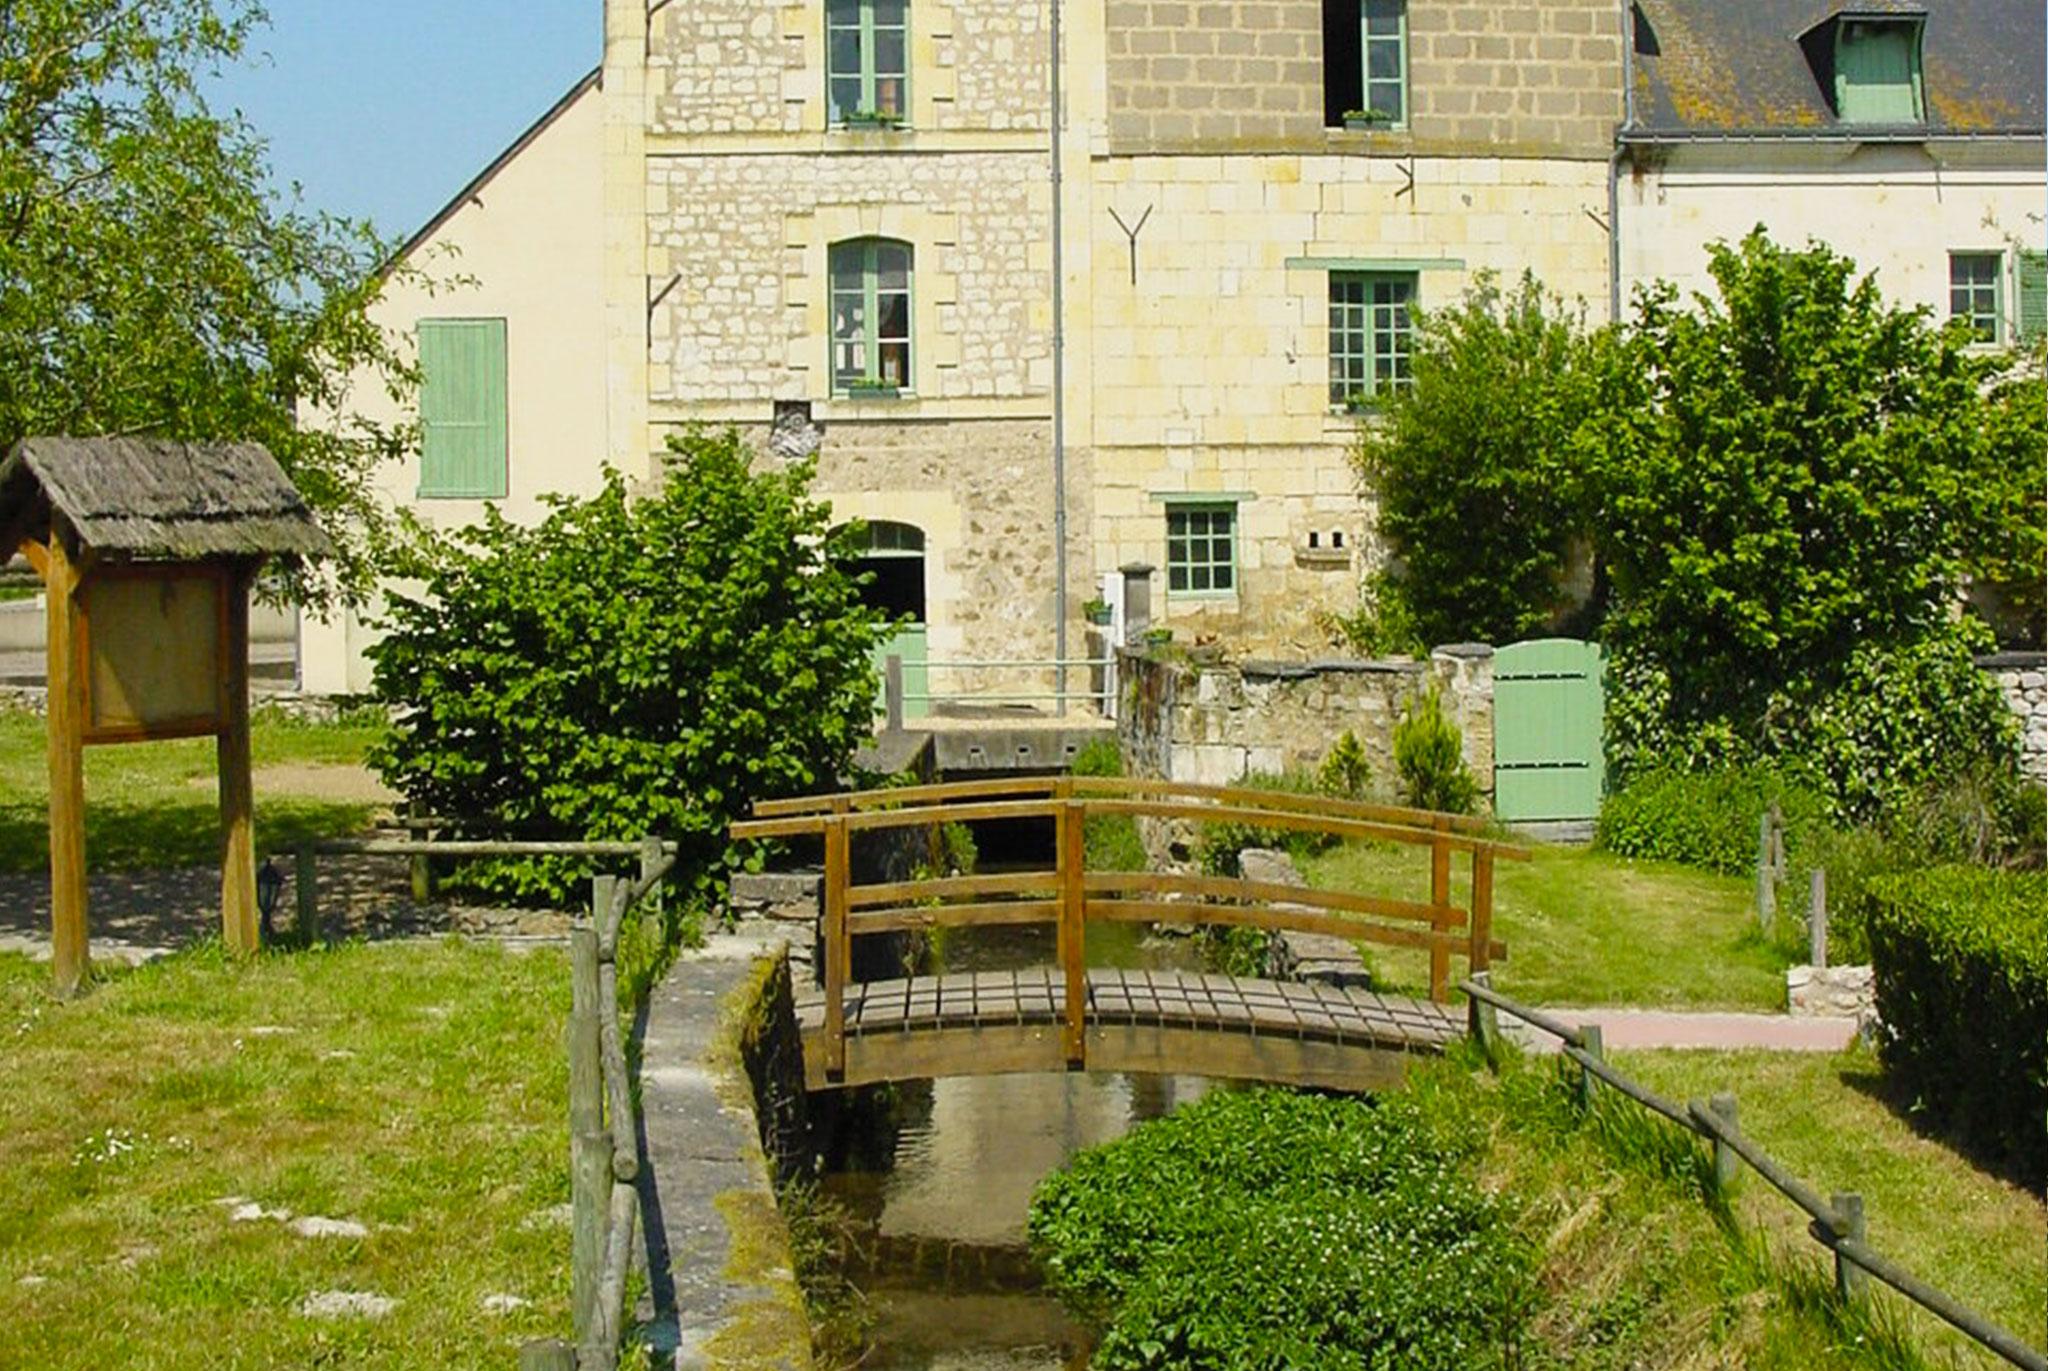 Moulin de Sarre